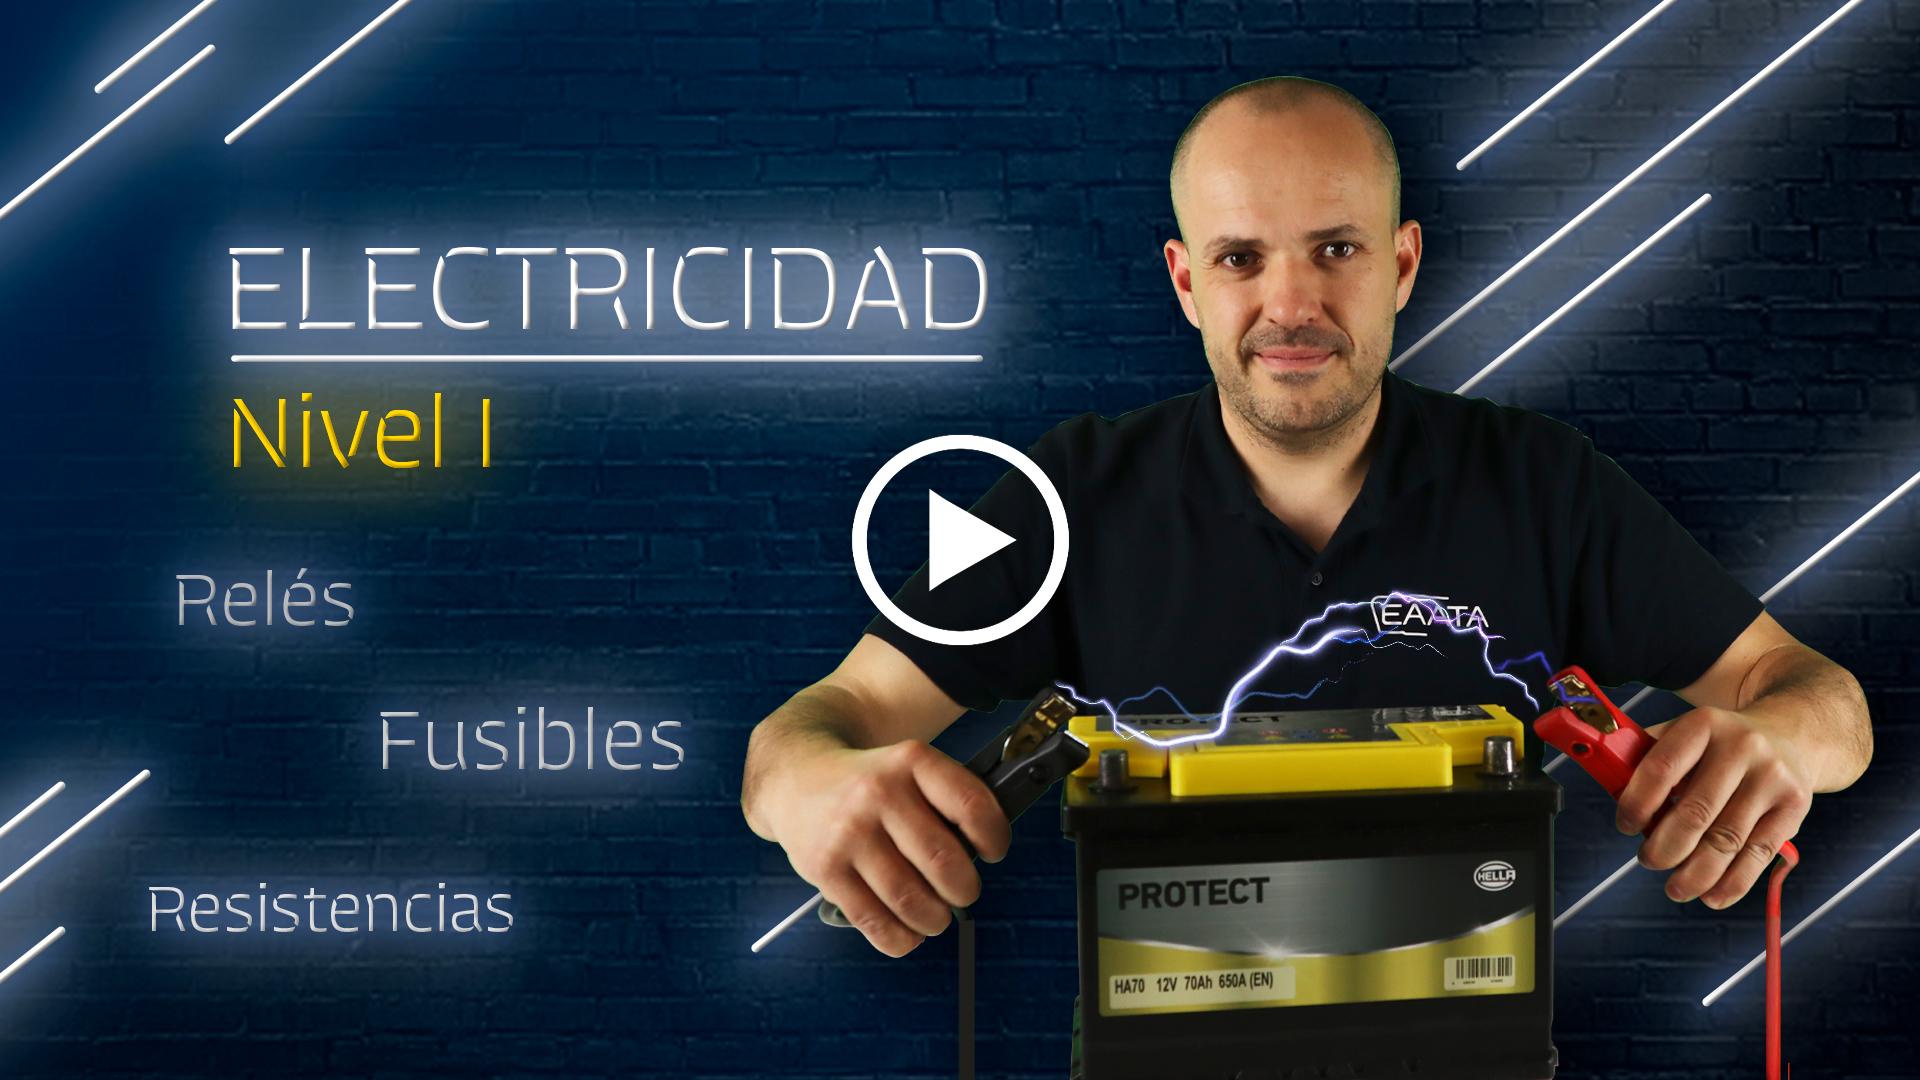 Electricidad Nivel I course image